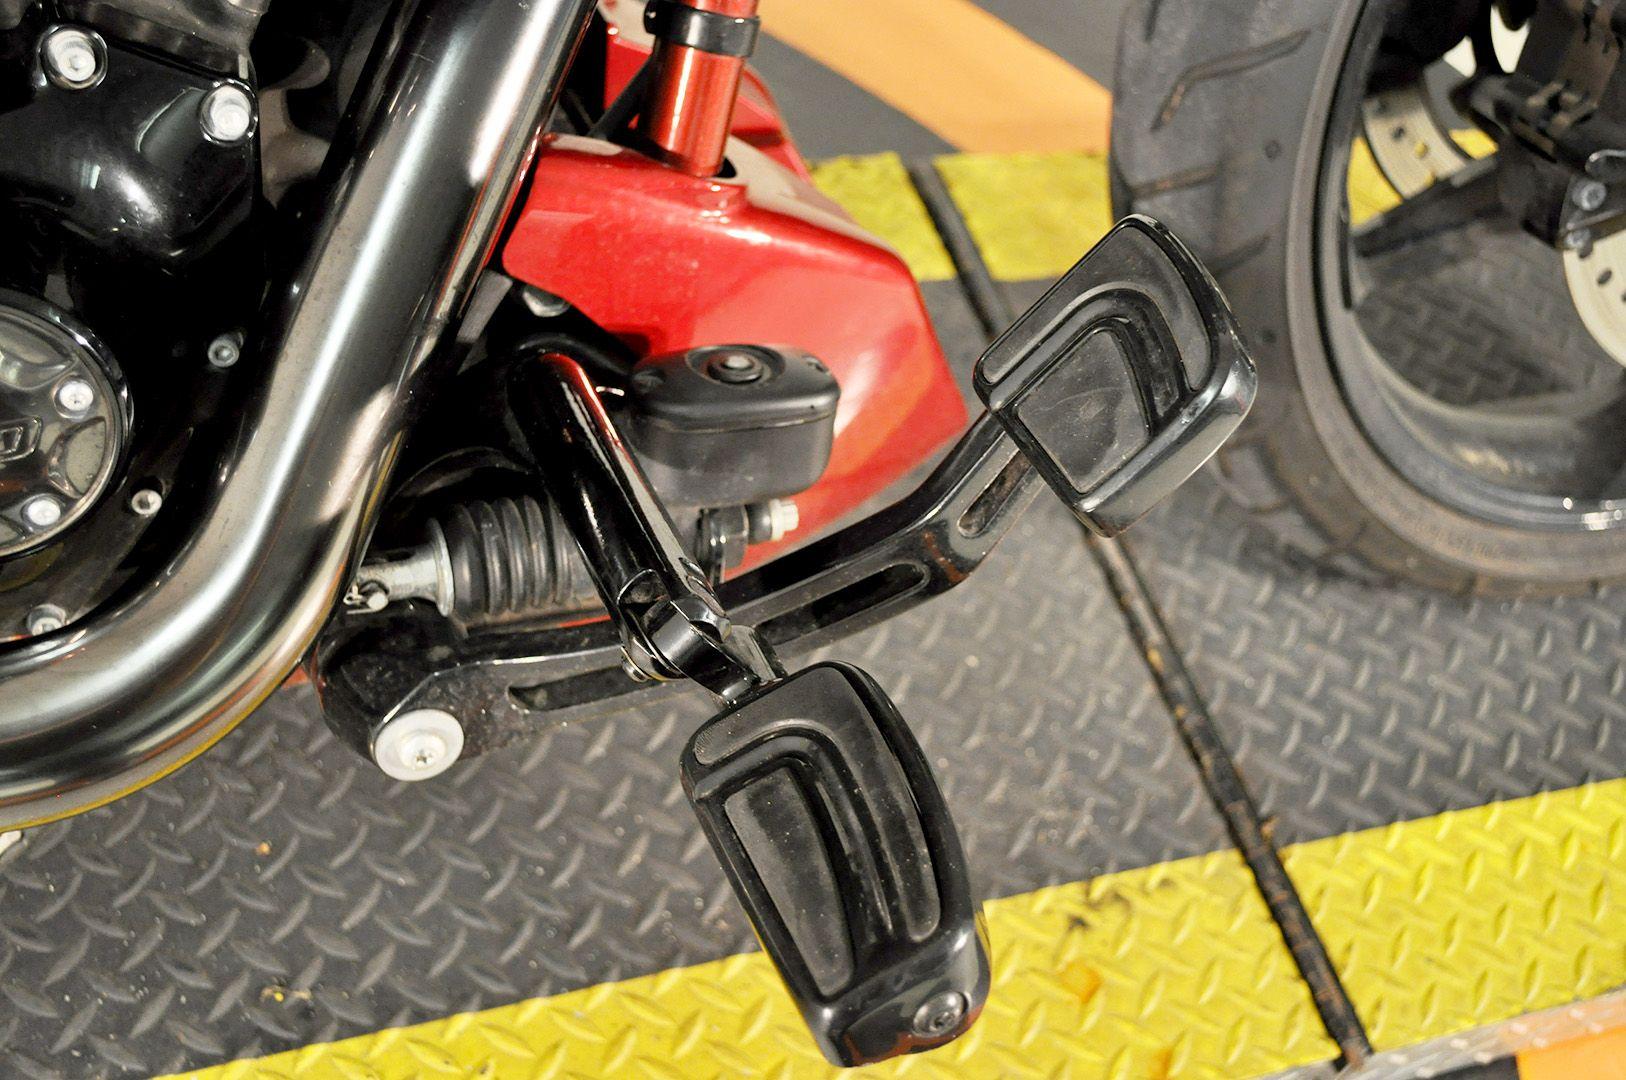 Pre-Owned 2017 Harley-Davidson CVO Pro Street Breakout